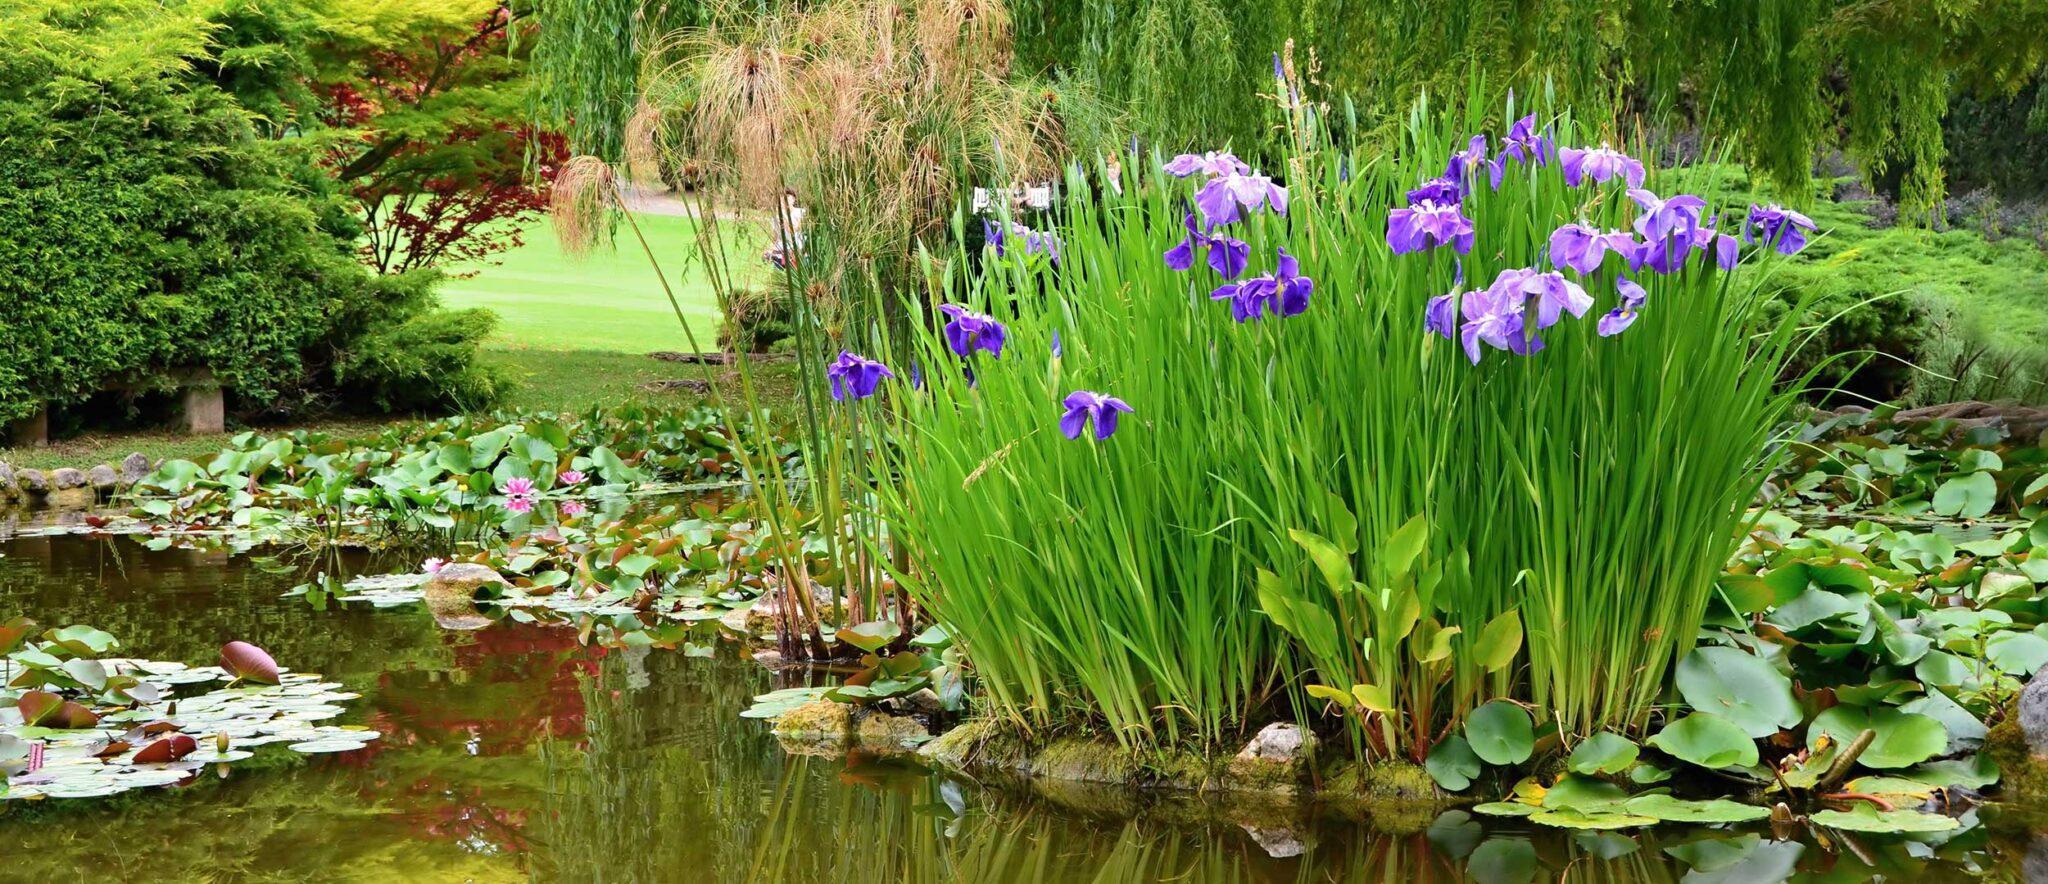 Classic pond